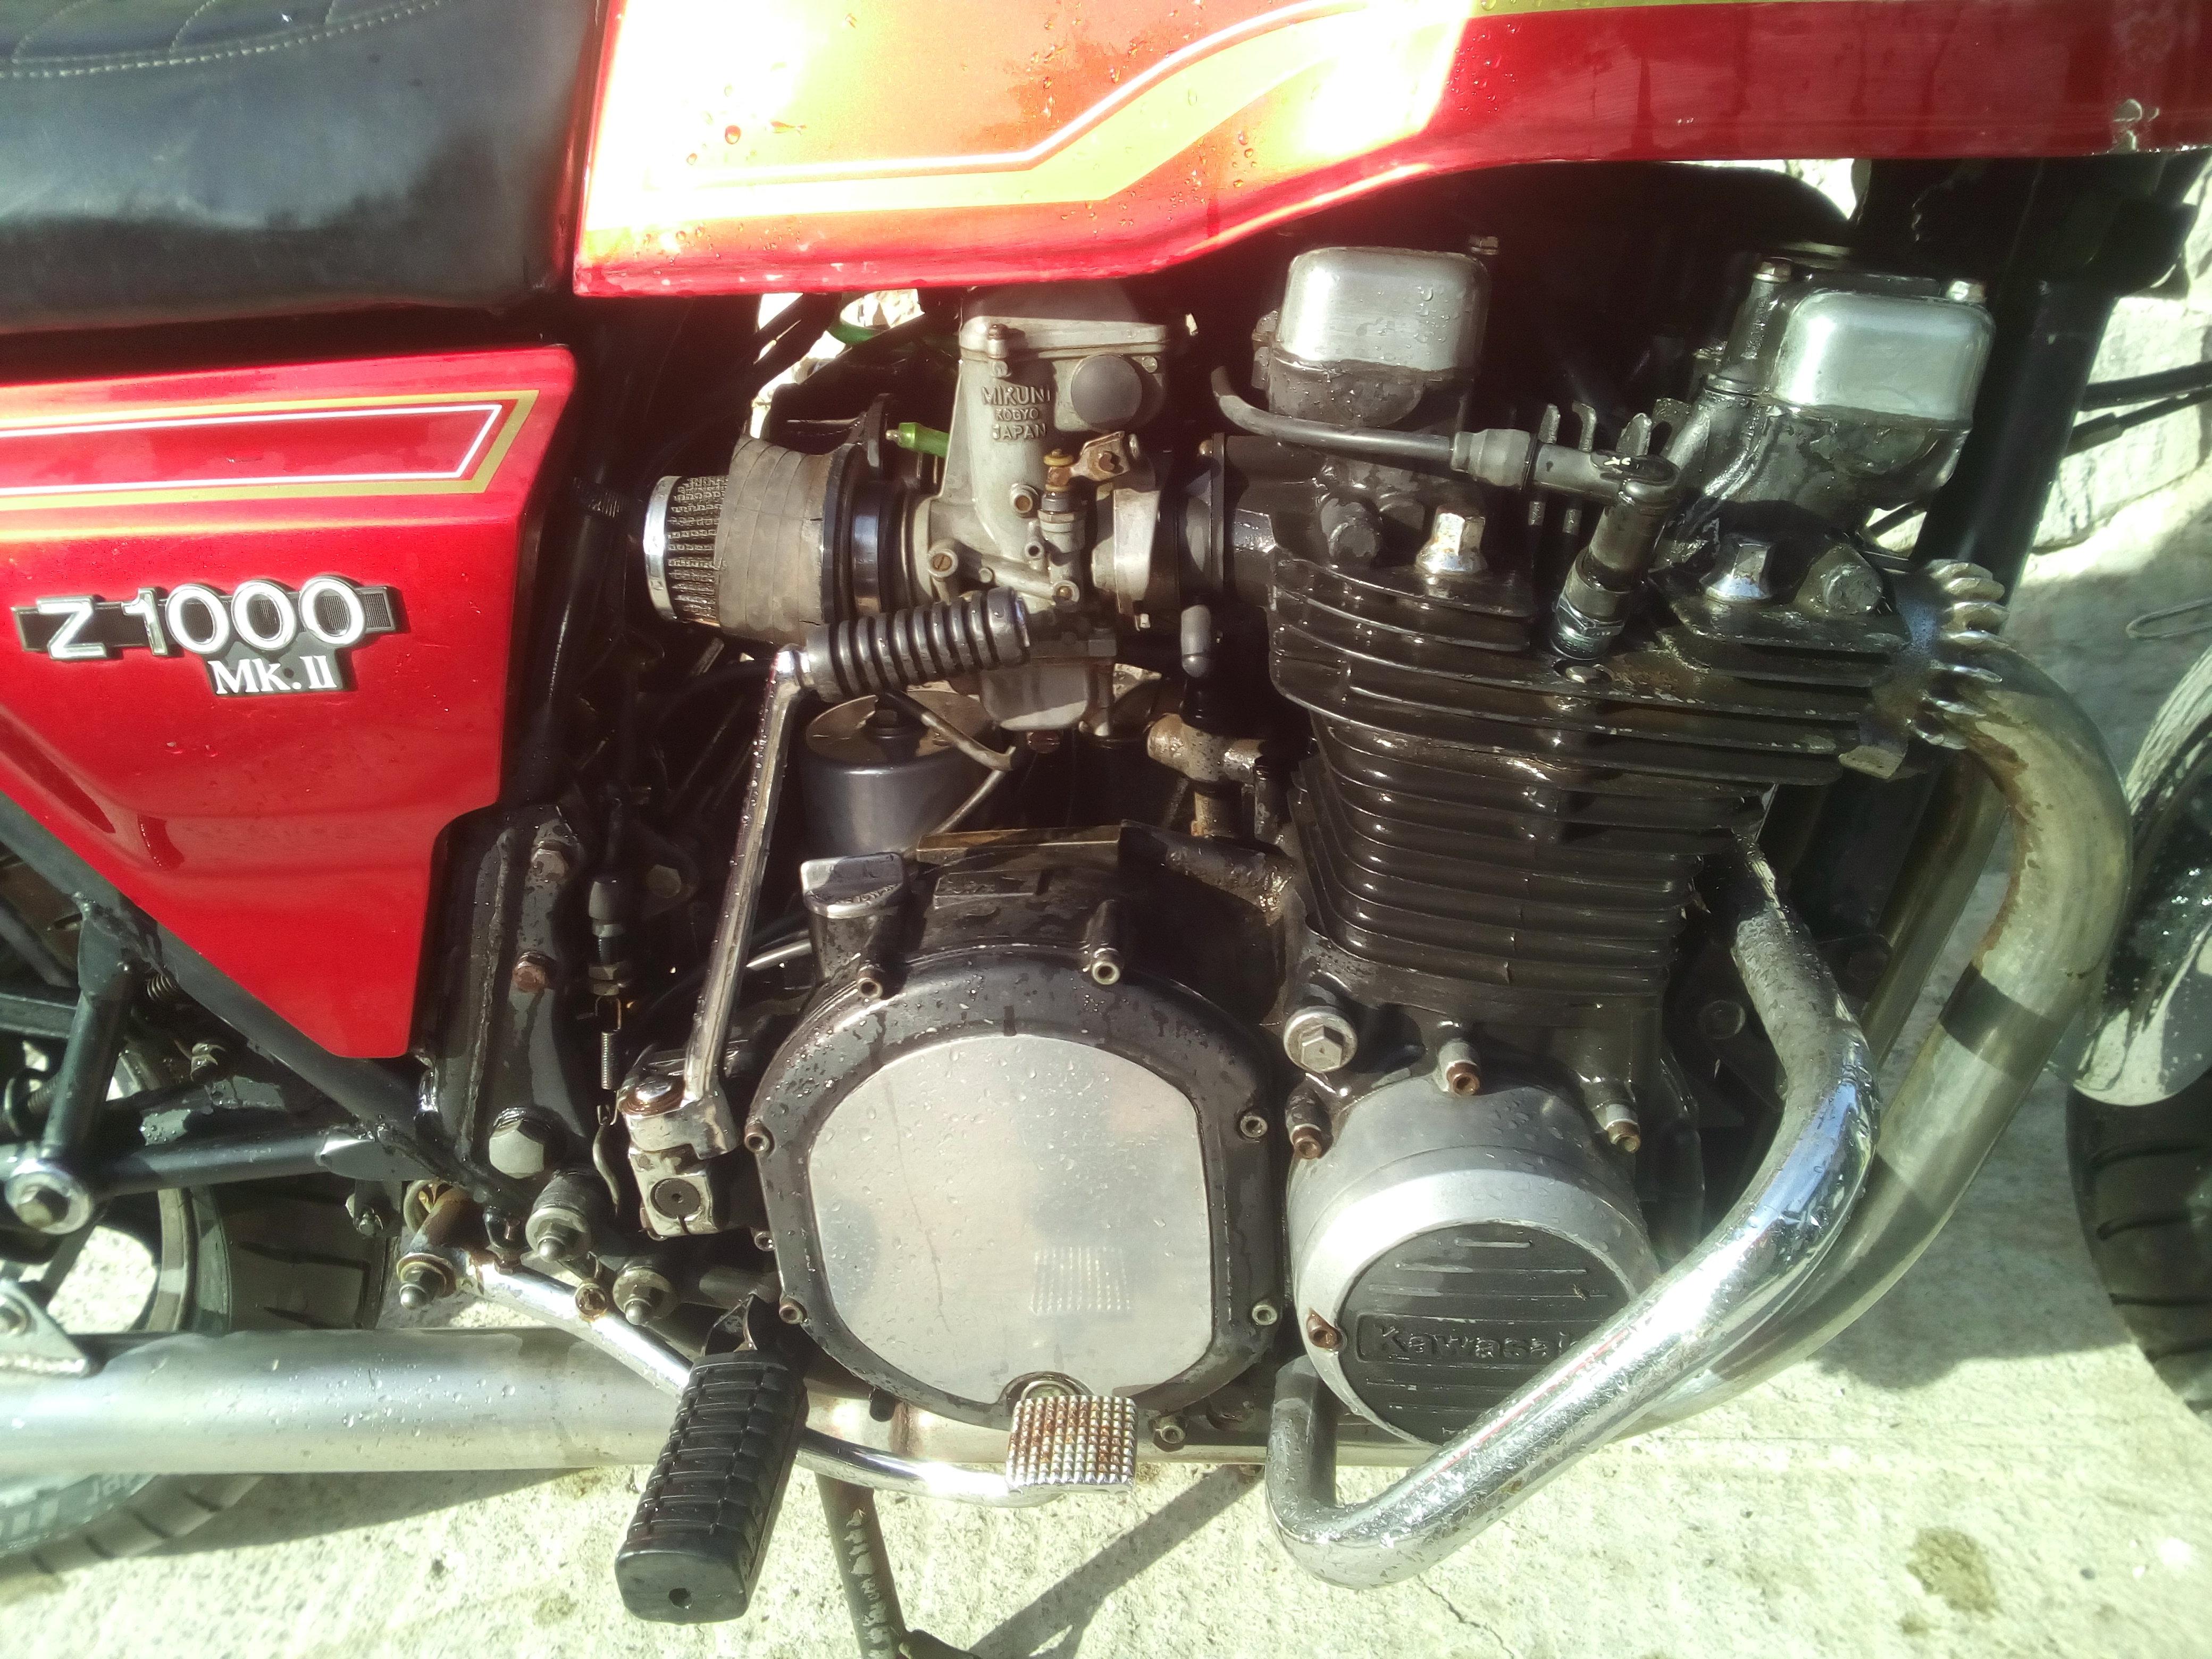 1979 Kawasaki Z1000 MK II For Sale (picture 1 of 4)